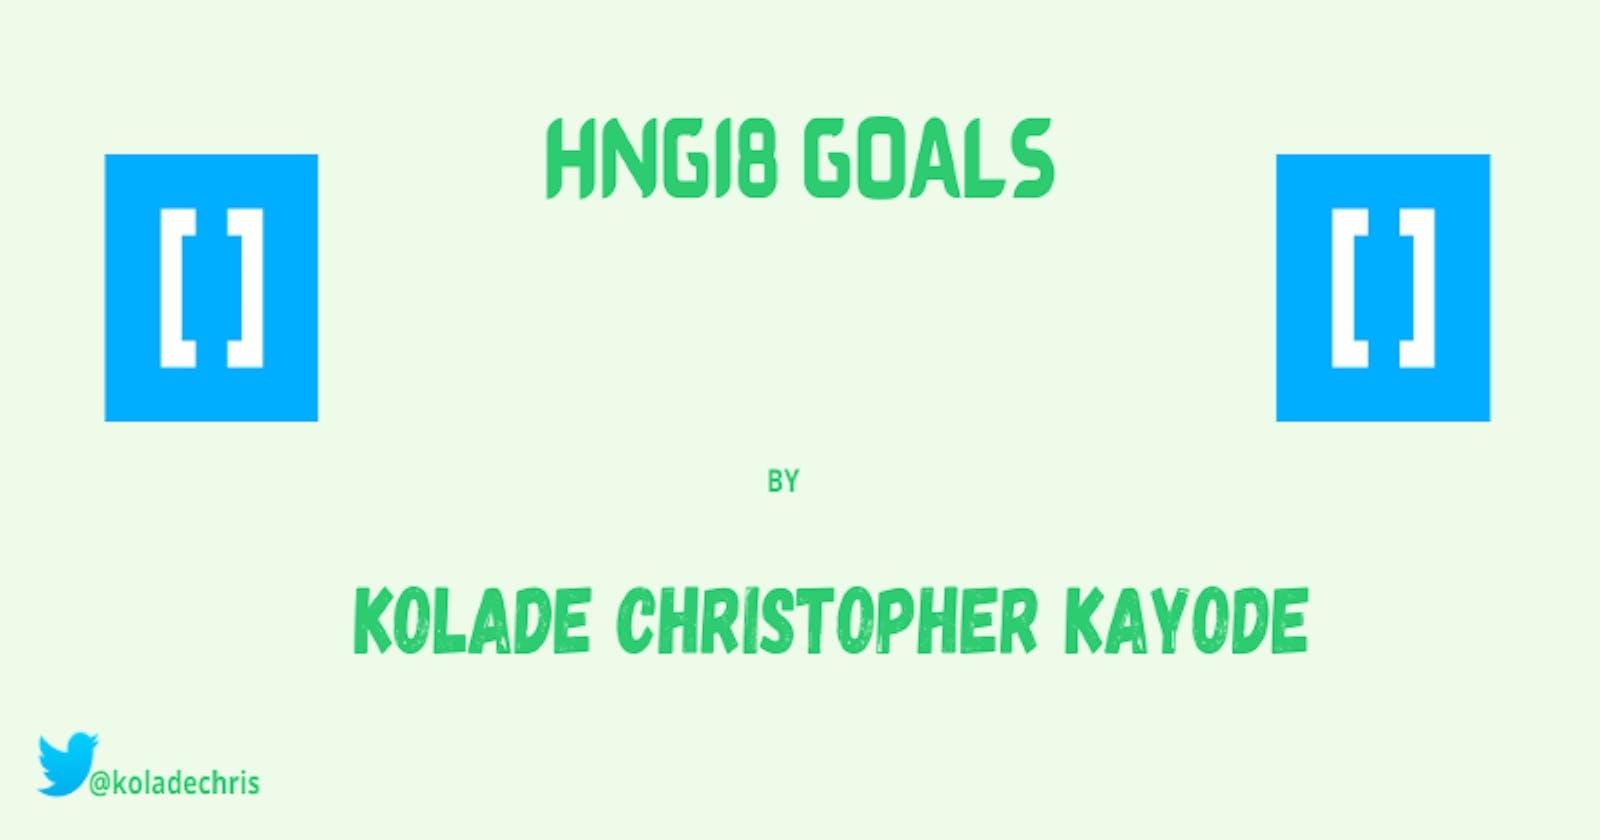 My HNGi8 Goals